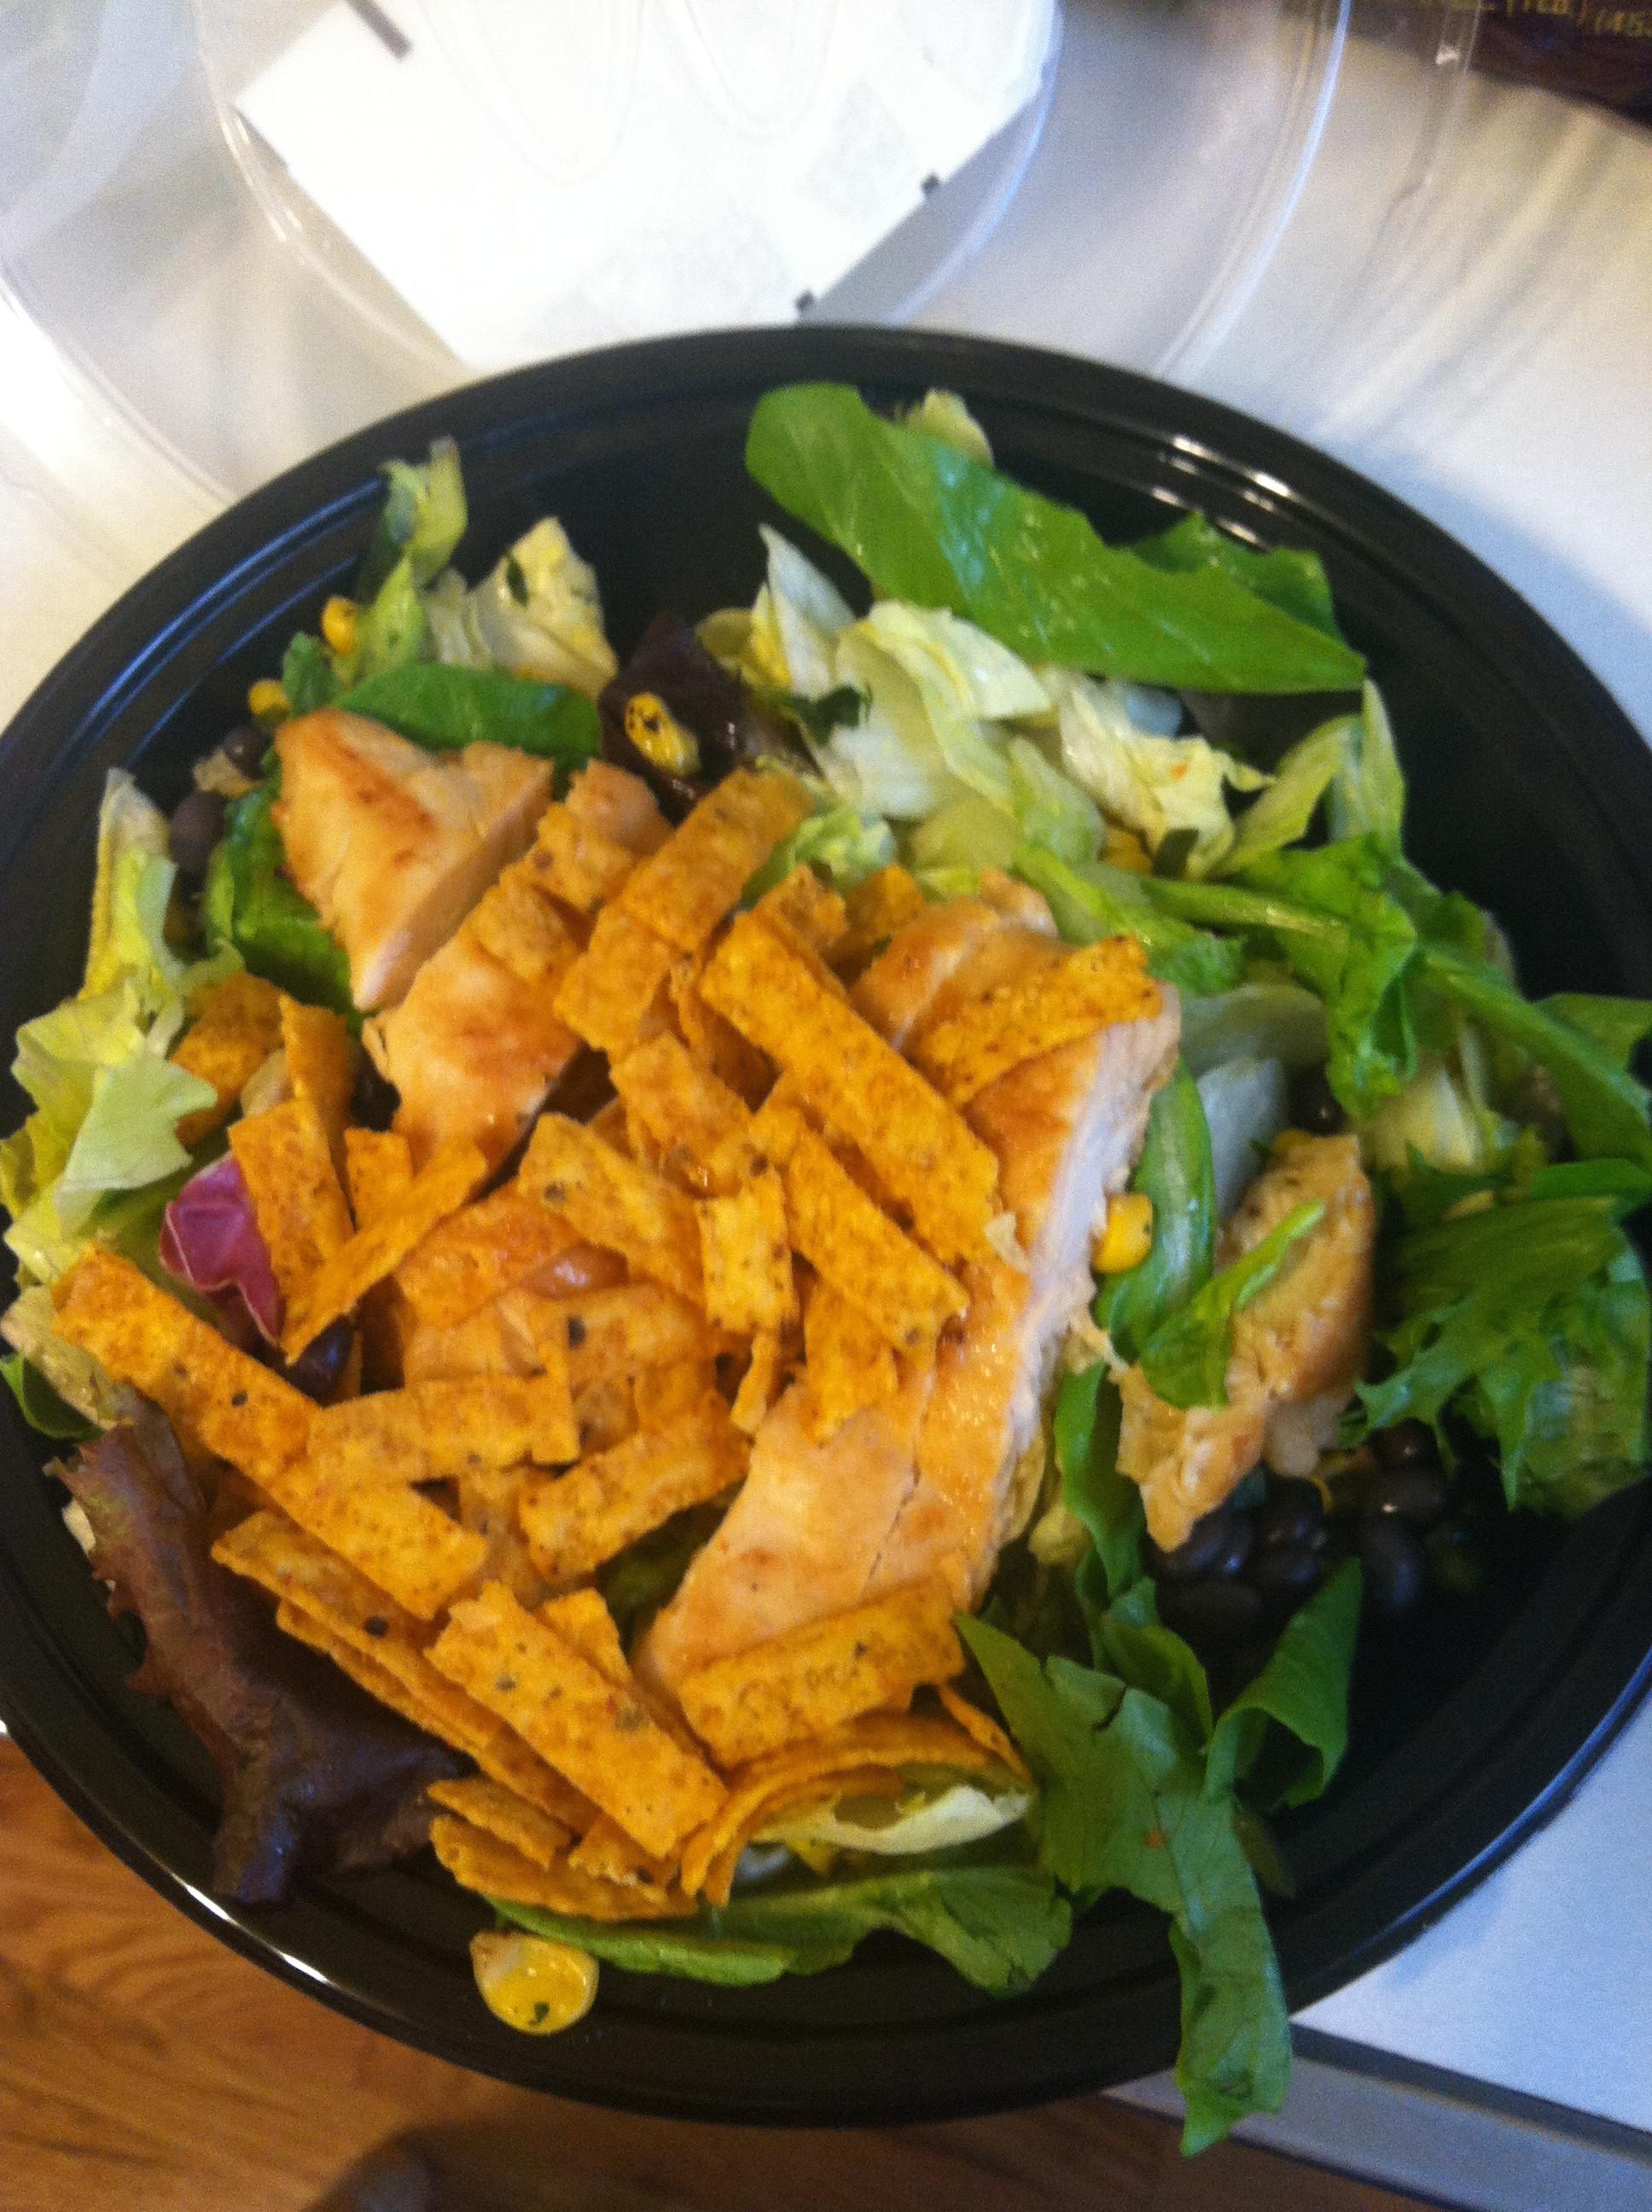 Mcdonalds Salads Healthy  I think I found something healthy at McDonald's